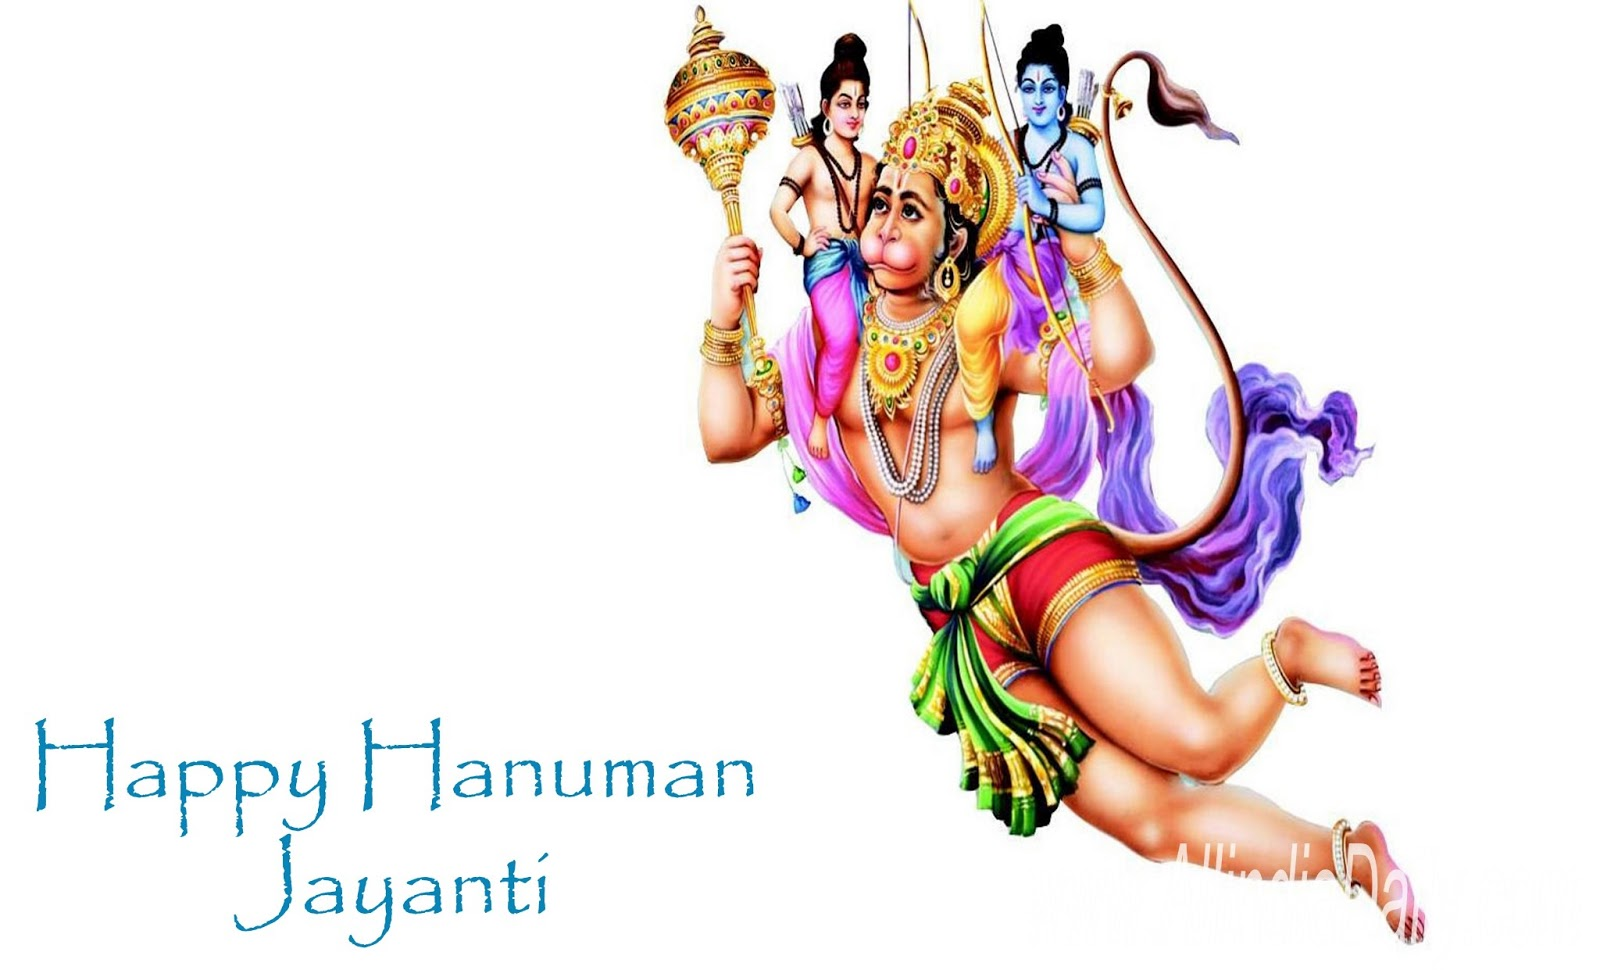 Hd wallpaper hanuman - Hanuman Jayanti Wishes Hd Wallpaper